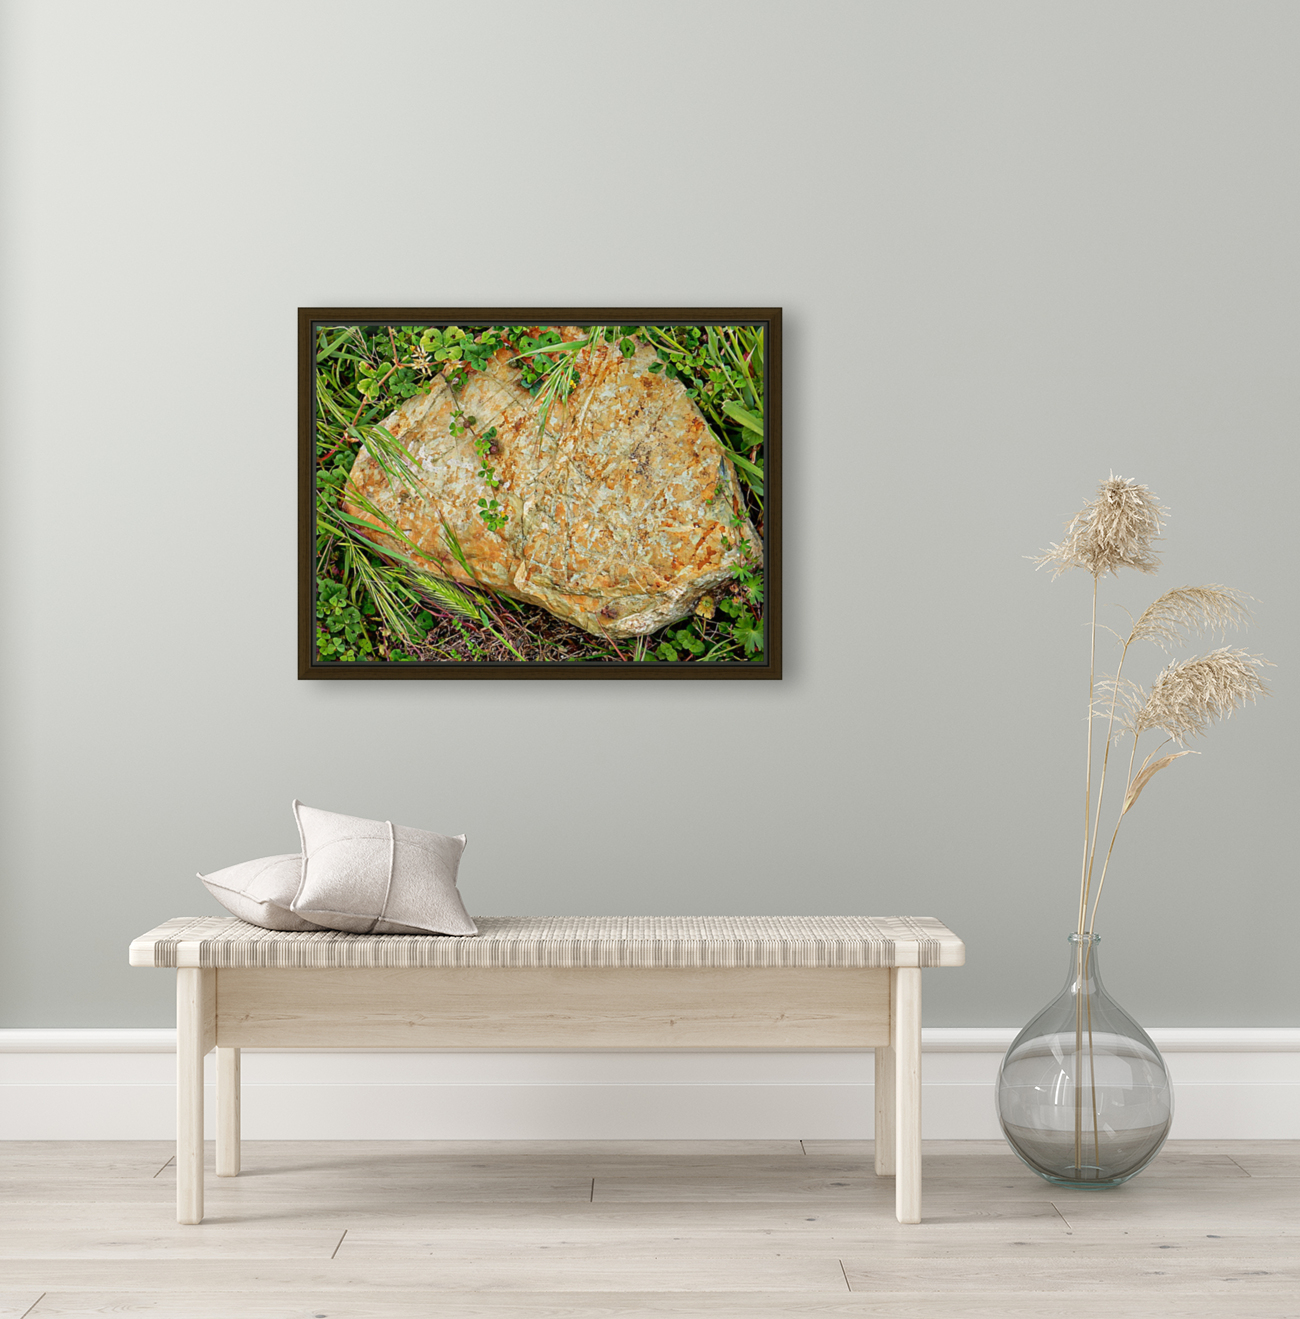 Brown Sandstone Rock With Grass  Art